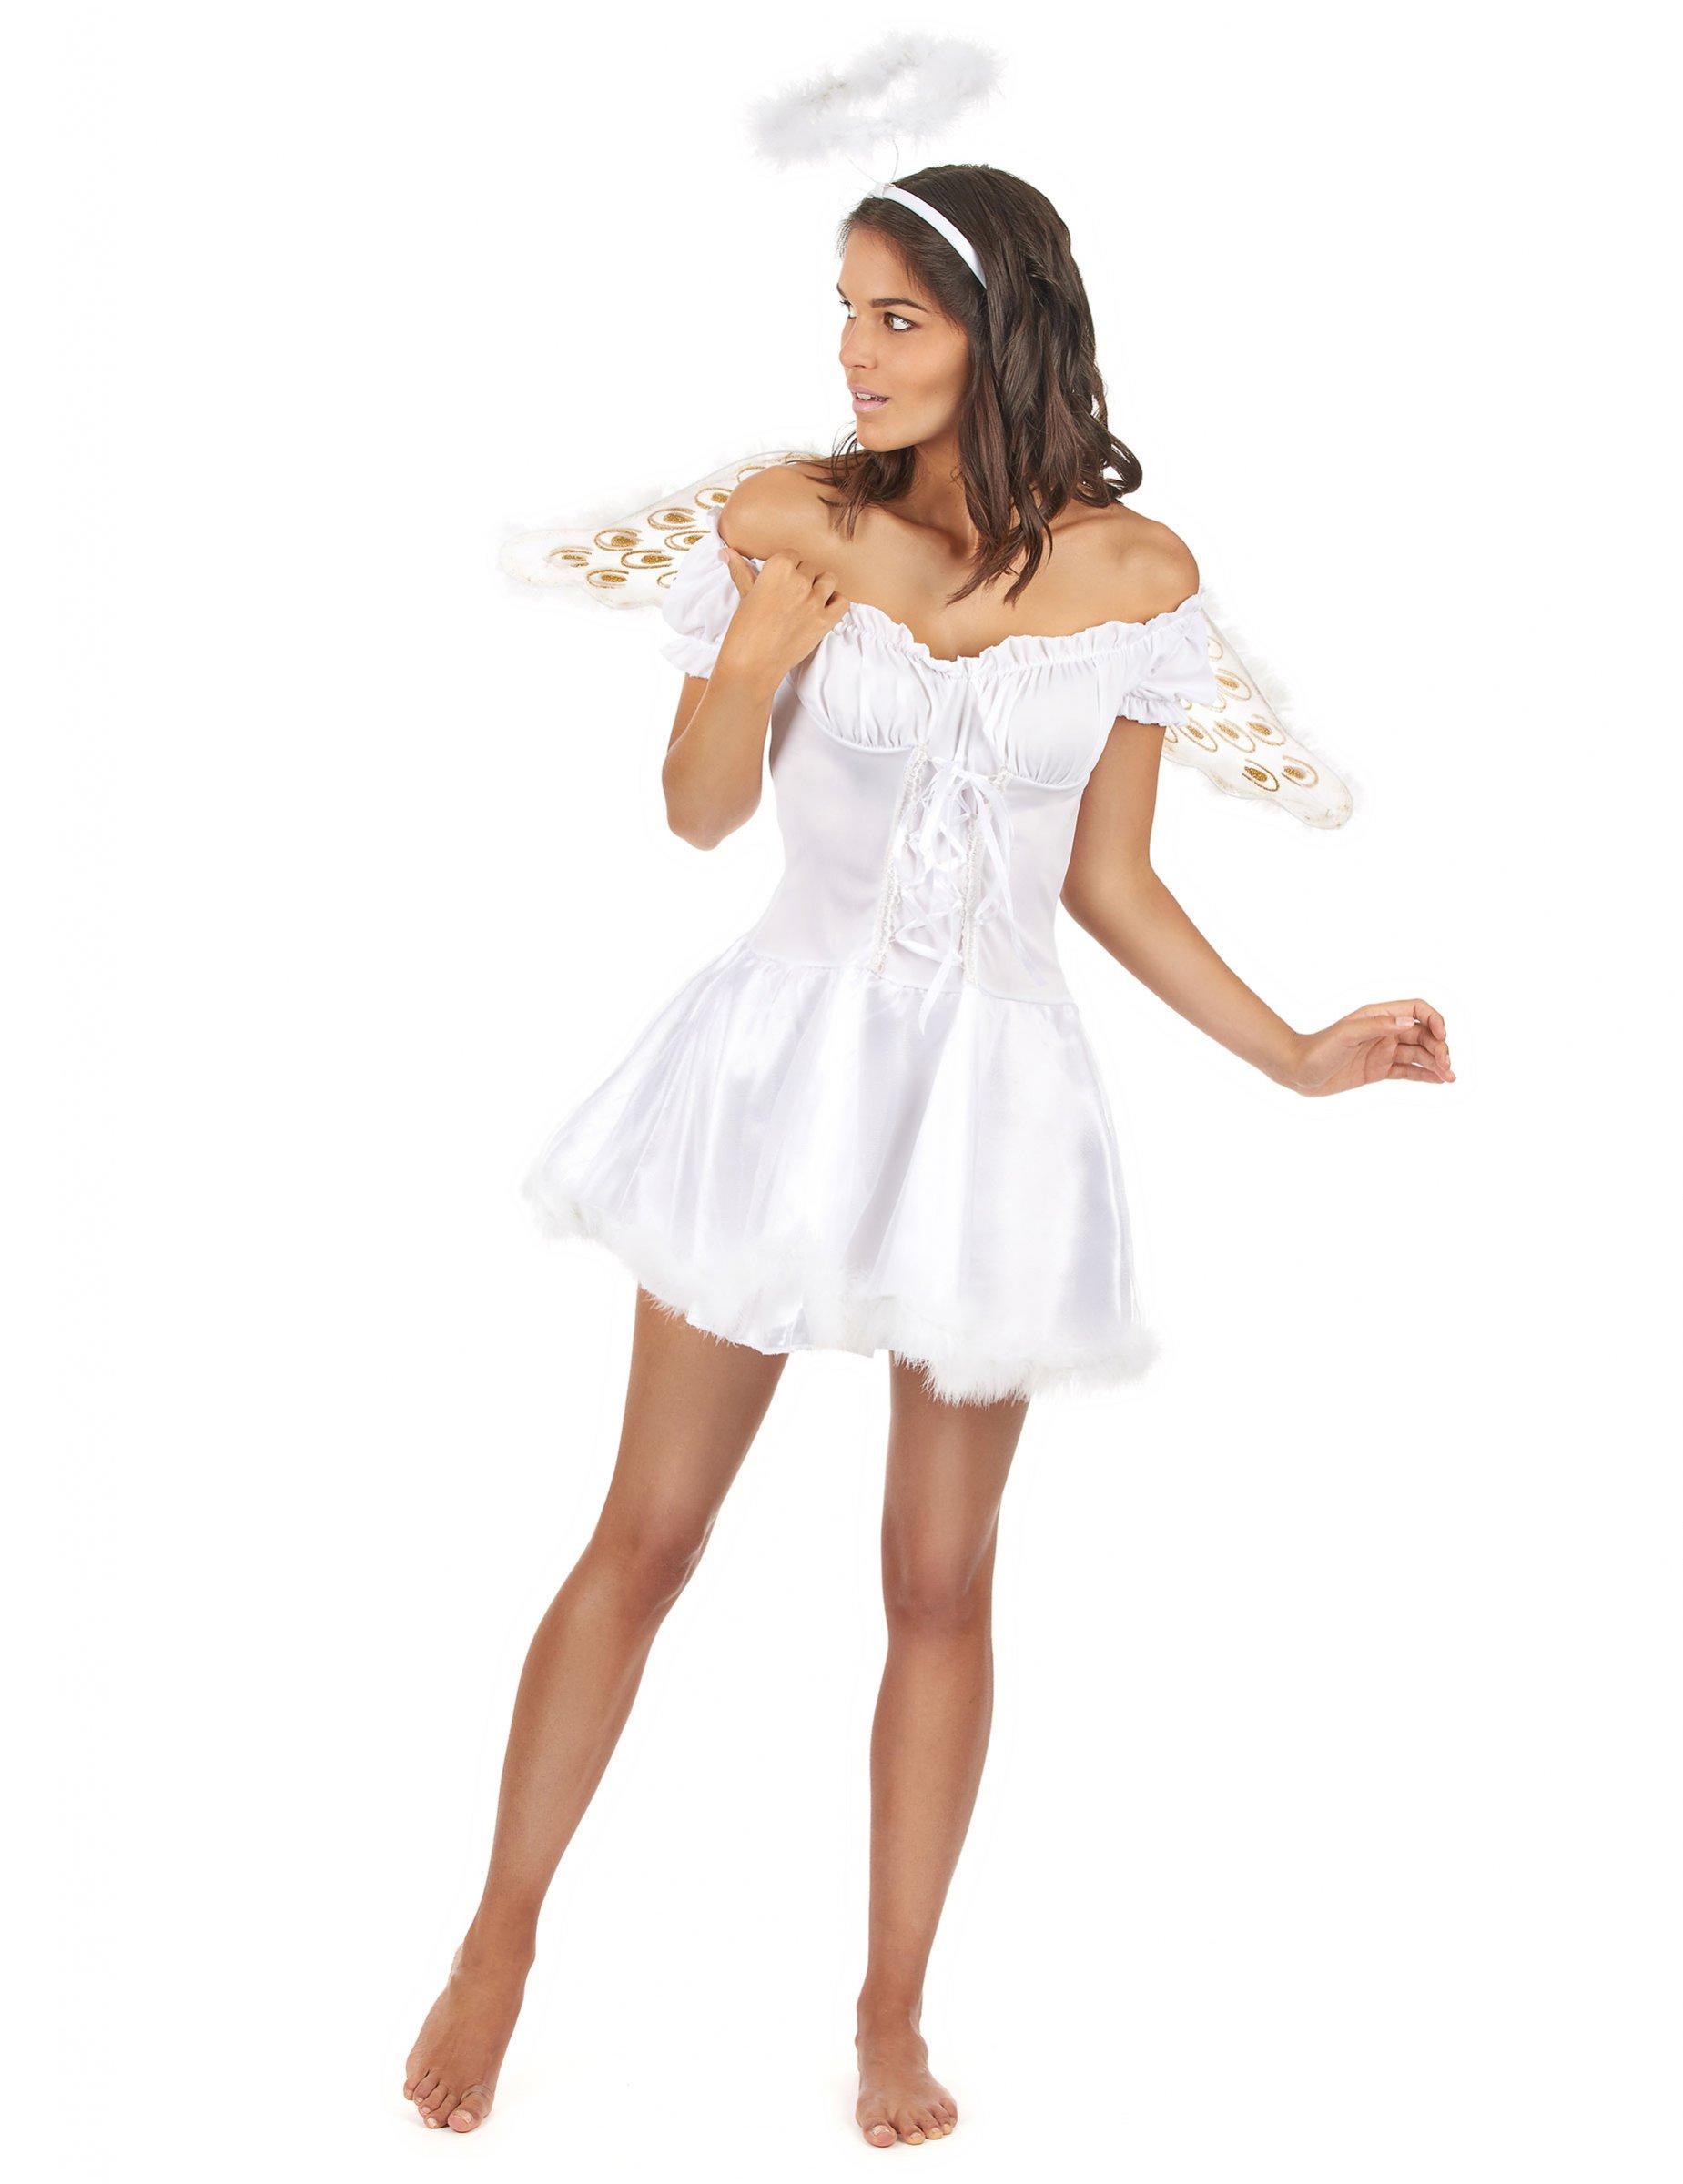 Engel Erwachsenenkostum Weiss Gunstige Faschings Kostume Bei